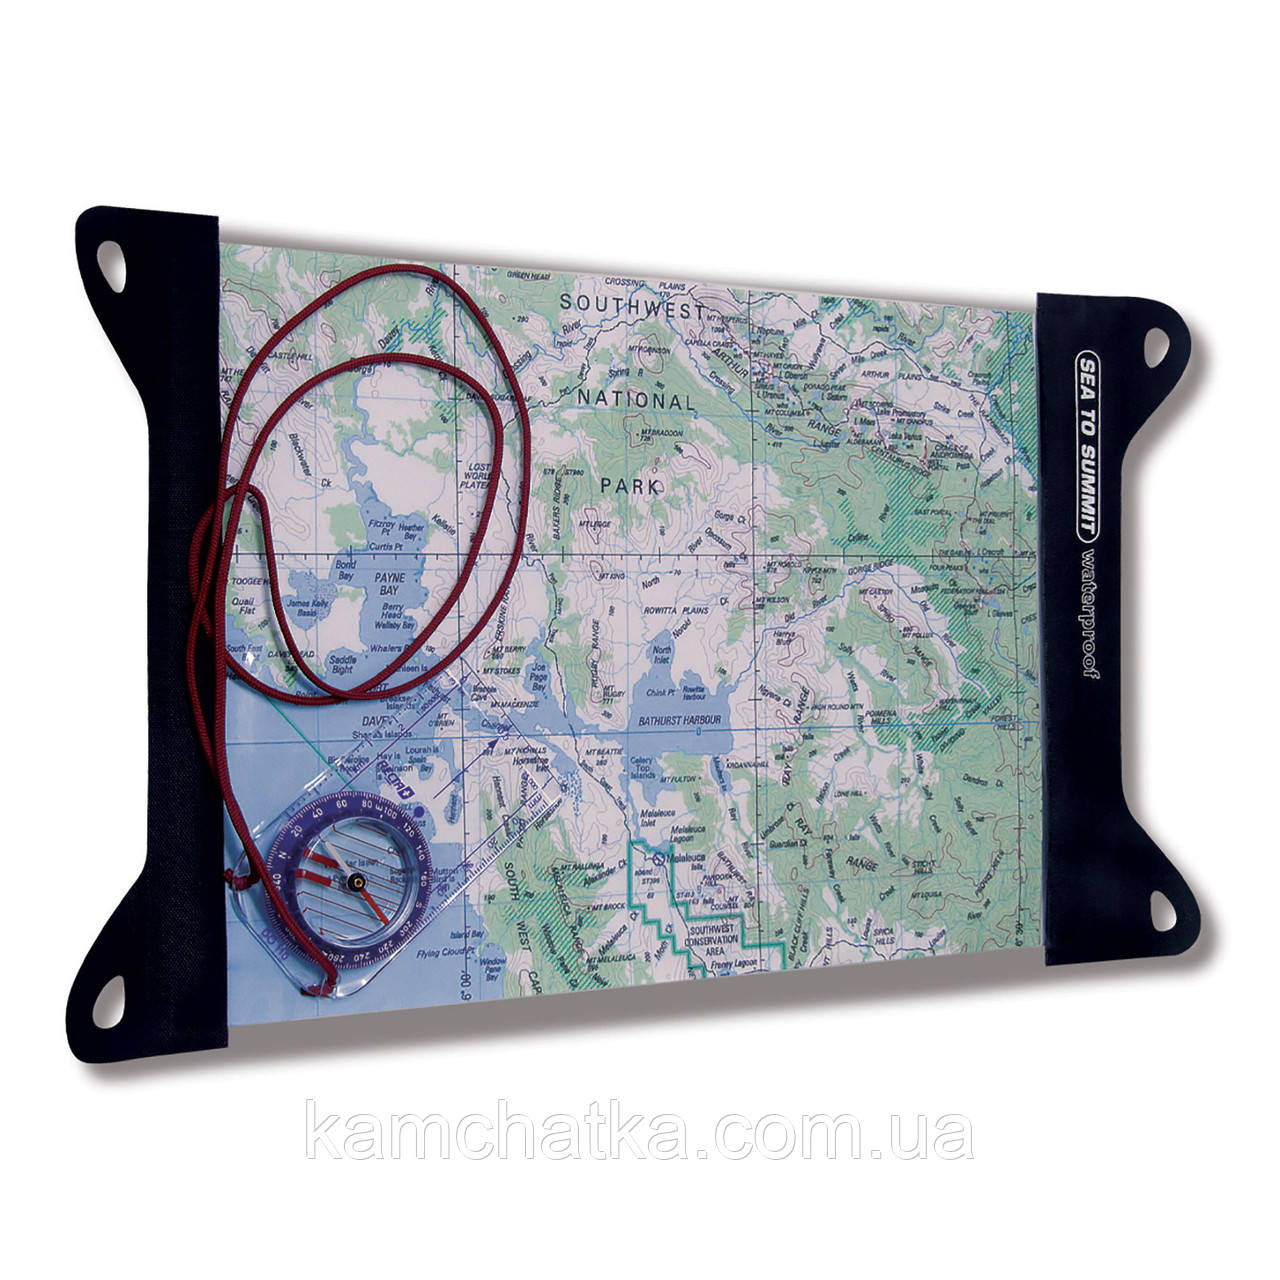 Водонепроницаемый чехол Sea To Summit Tpu Guide Map Case